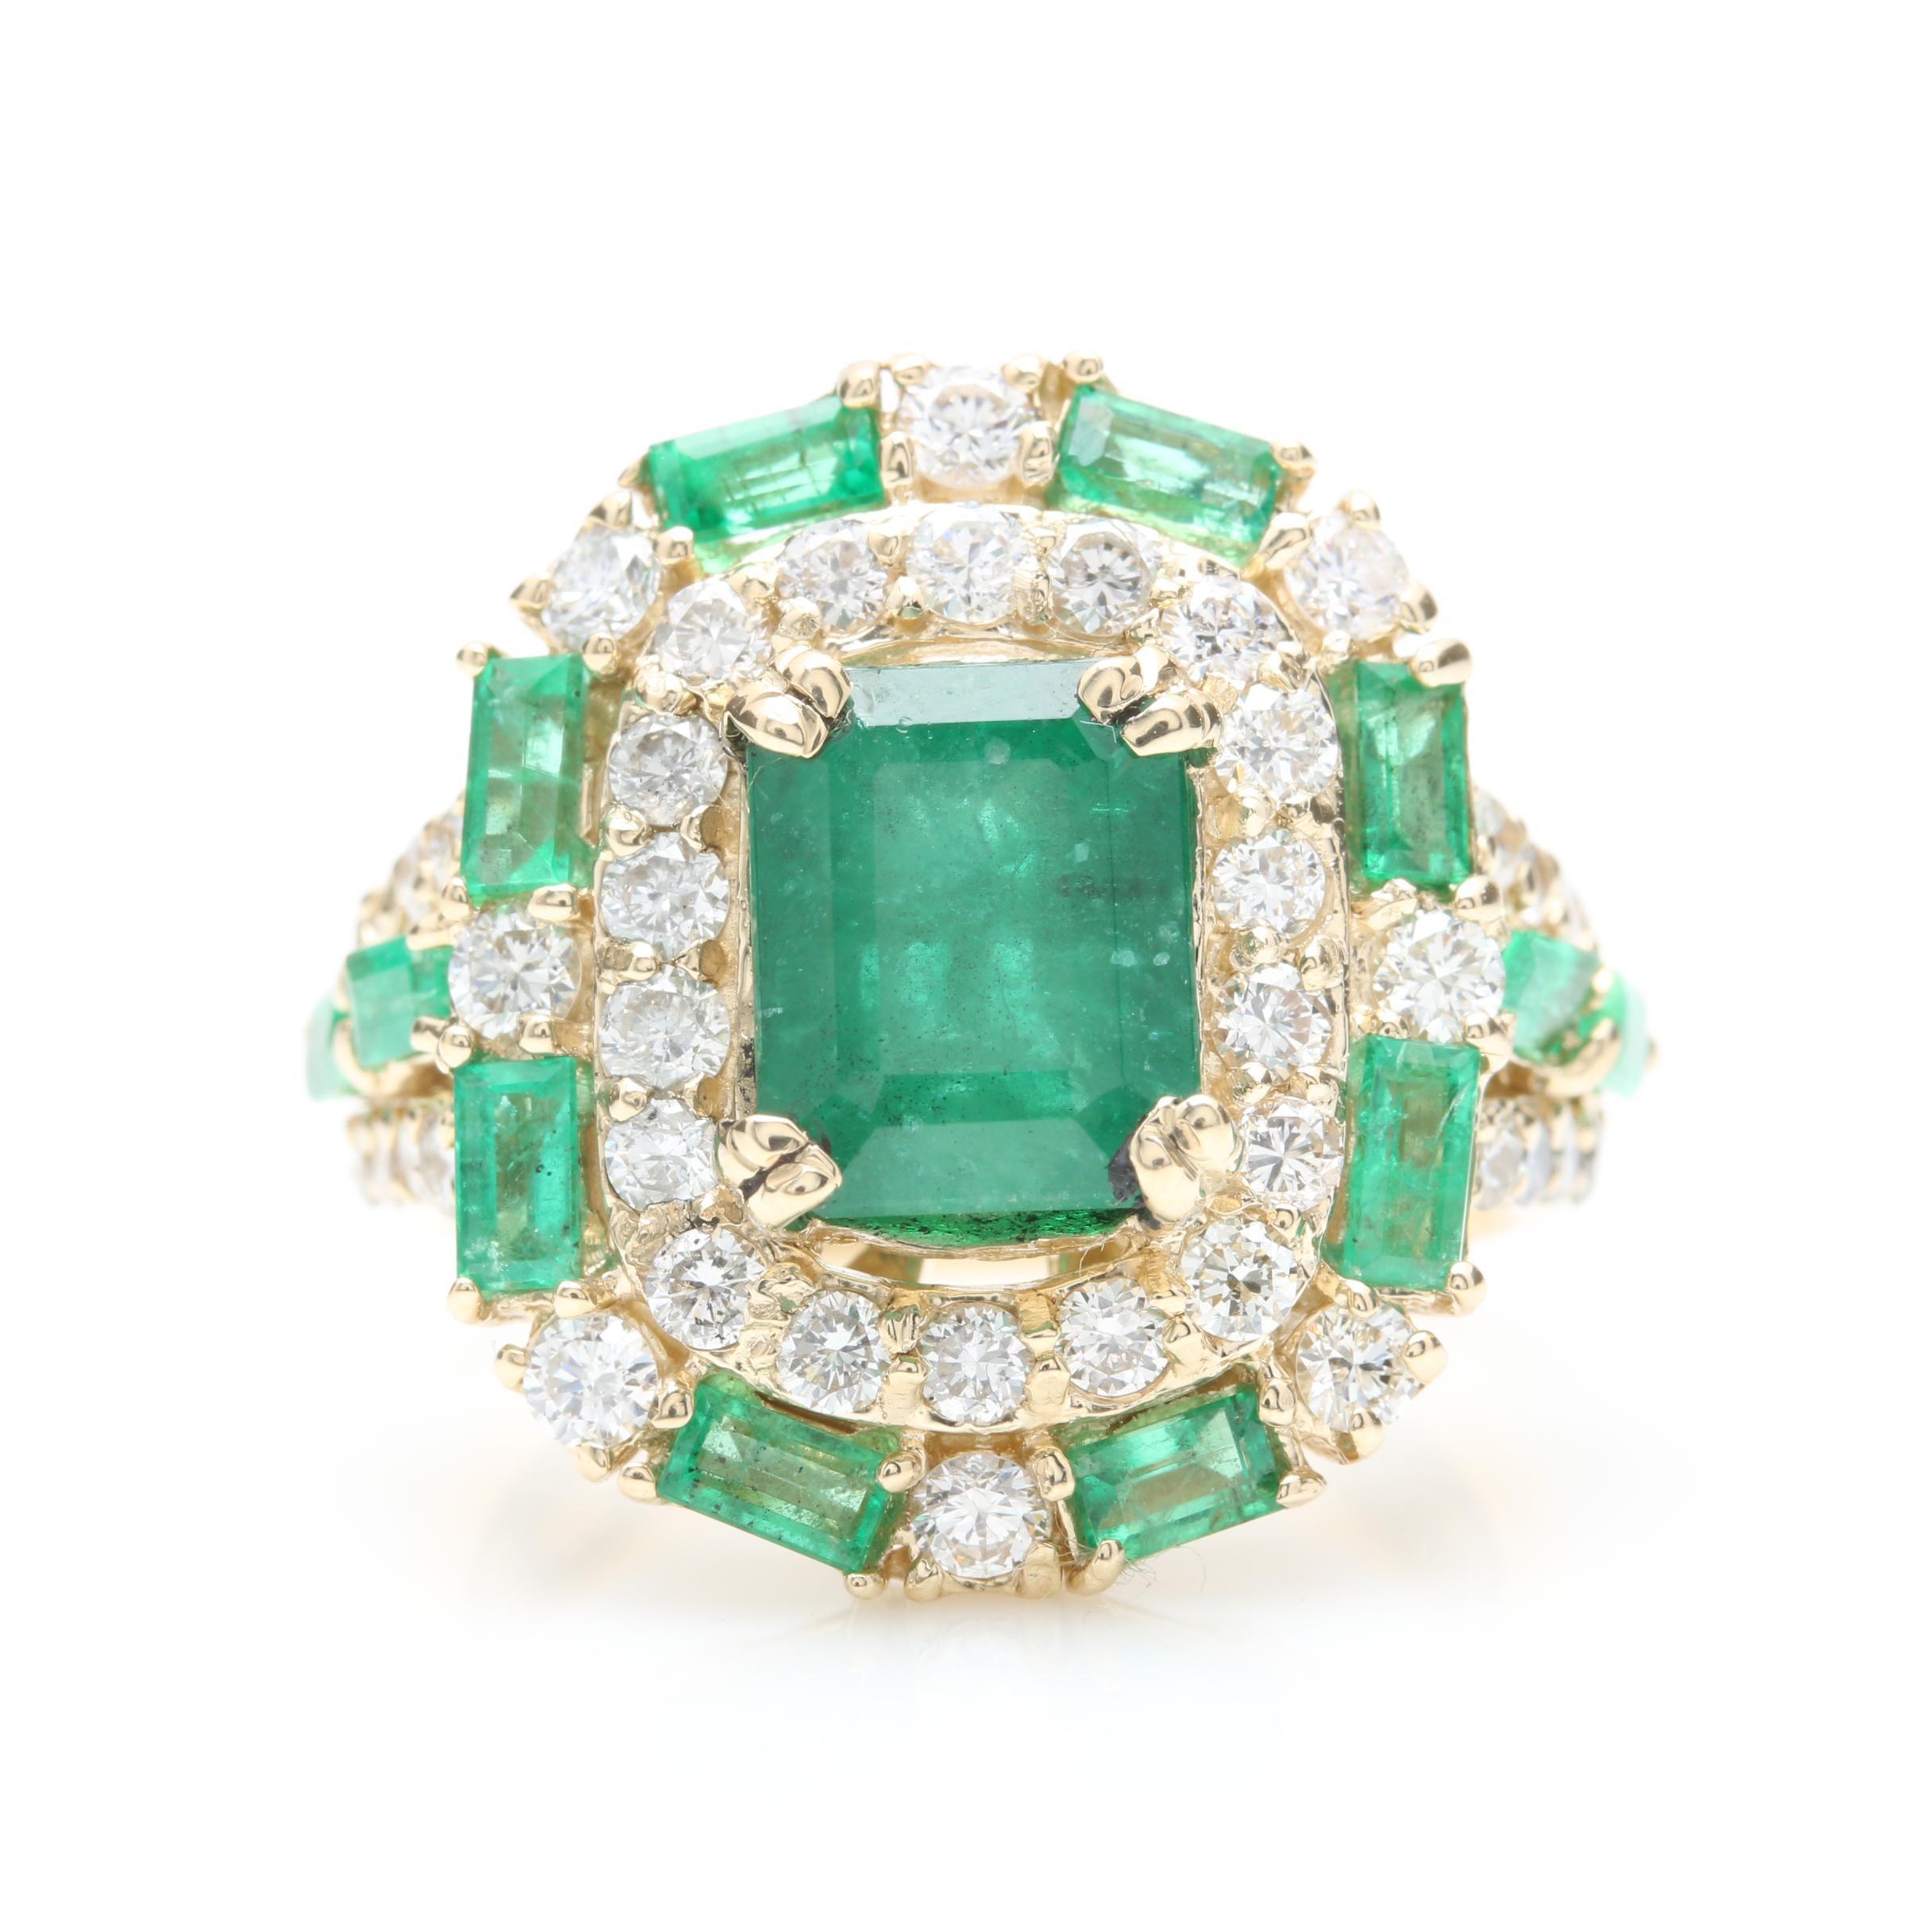 14K Yellow Gold 2.50 CT Emerald and 1.04 CTW Diamond Statement Ring